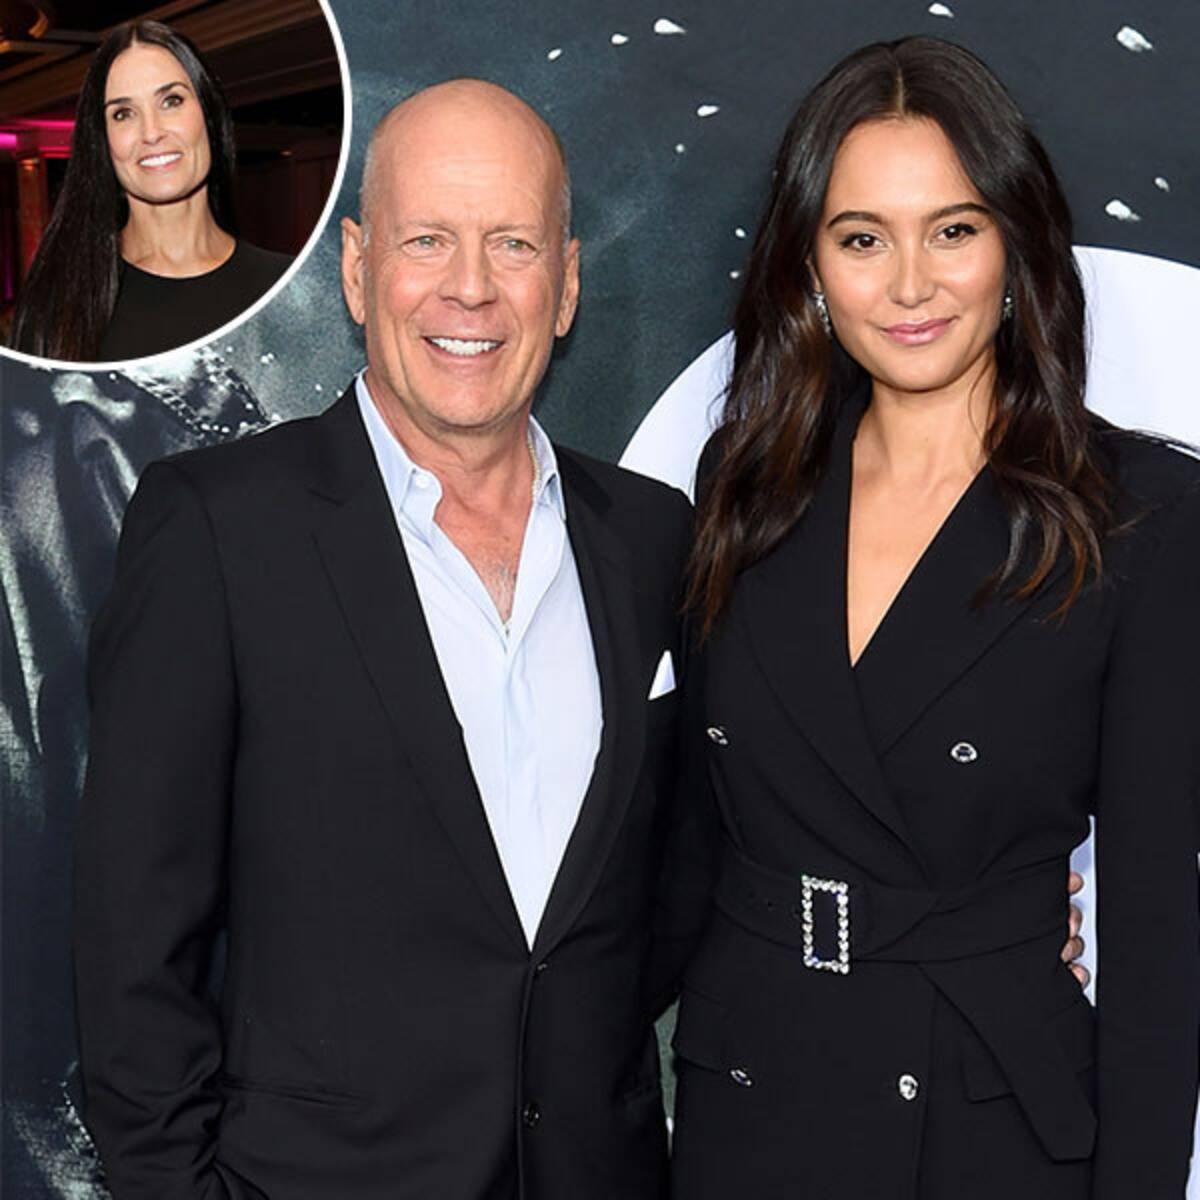 Bruce Willis and wife Emma reunite after quarantining apart